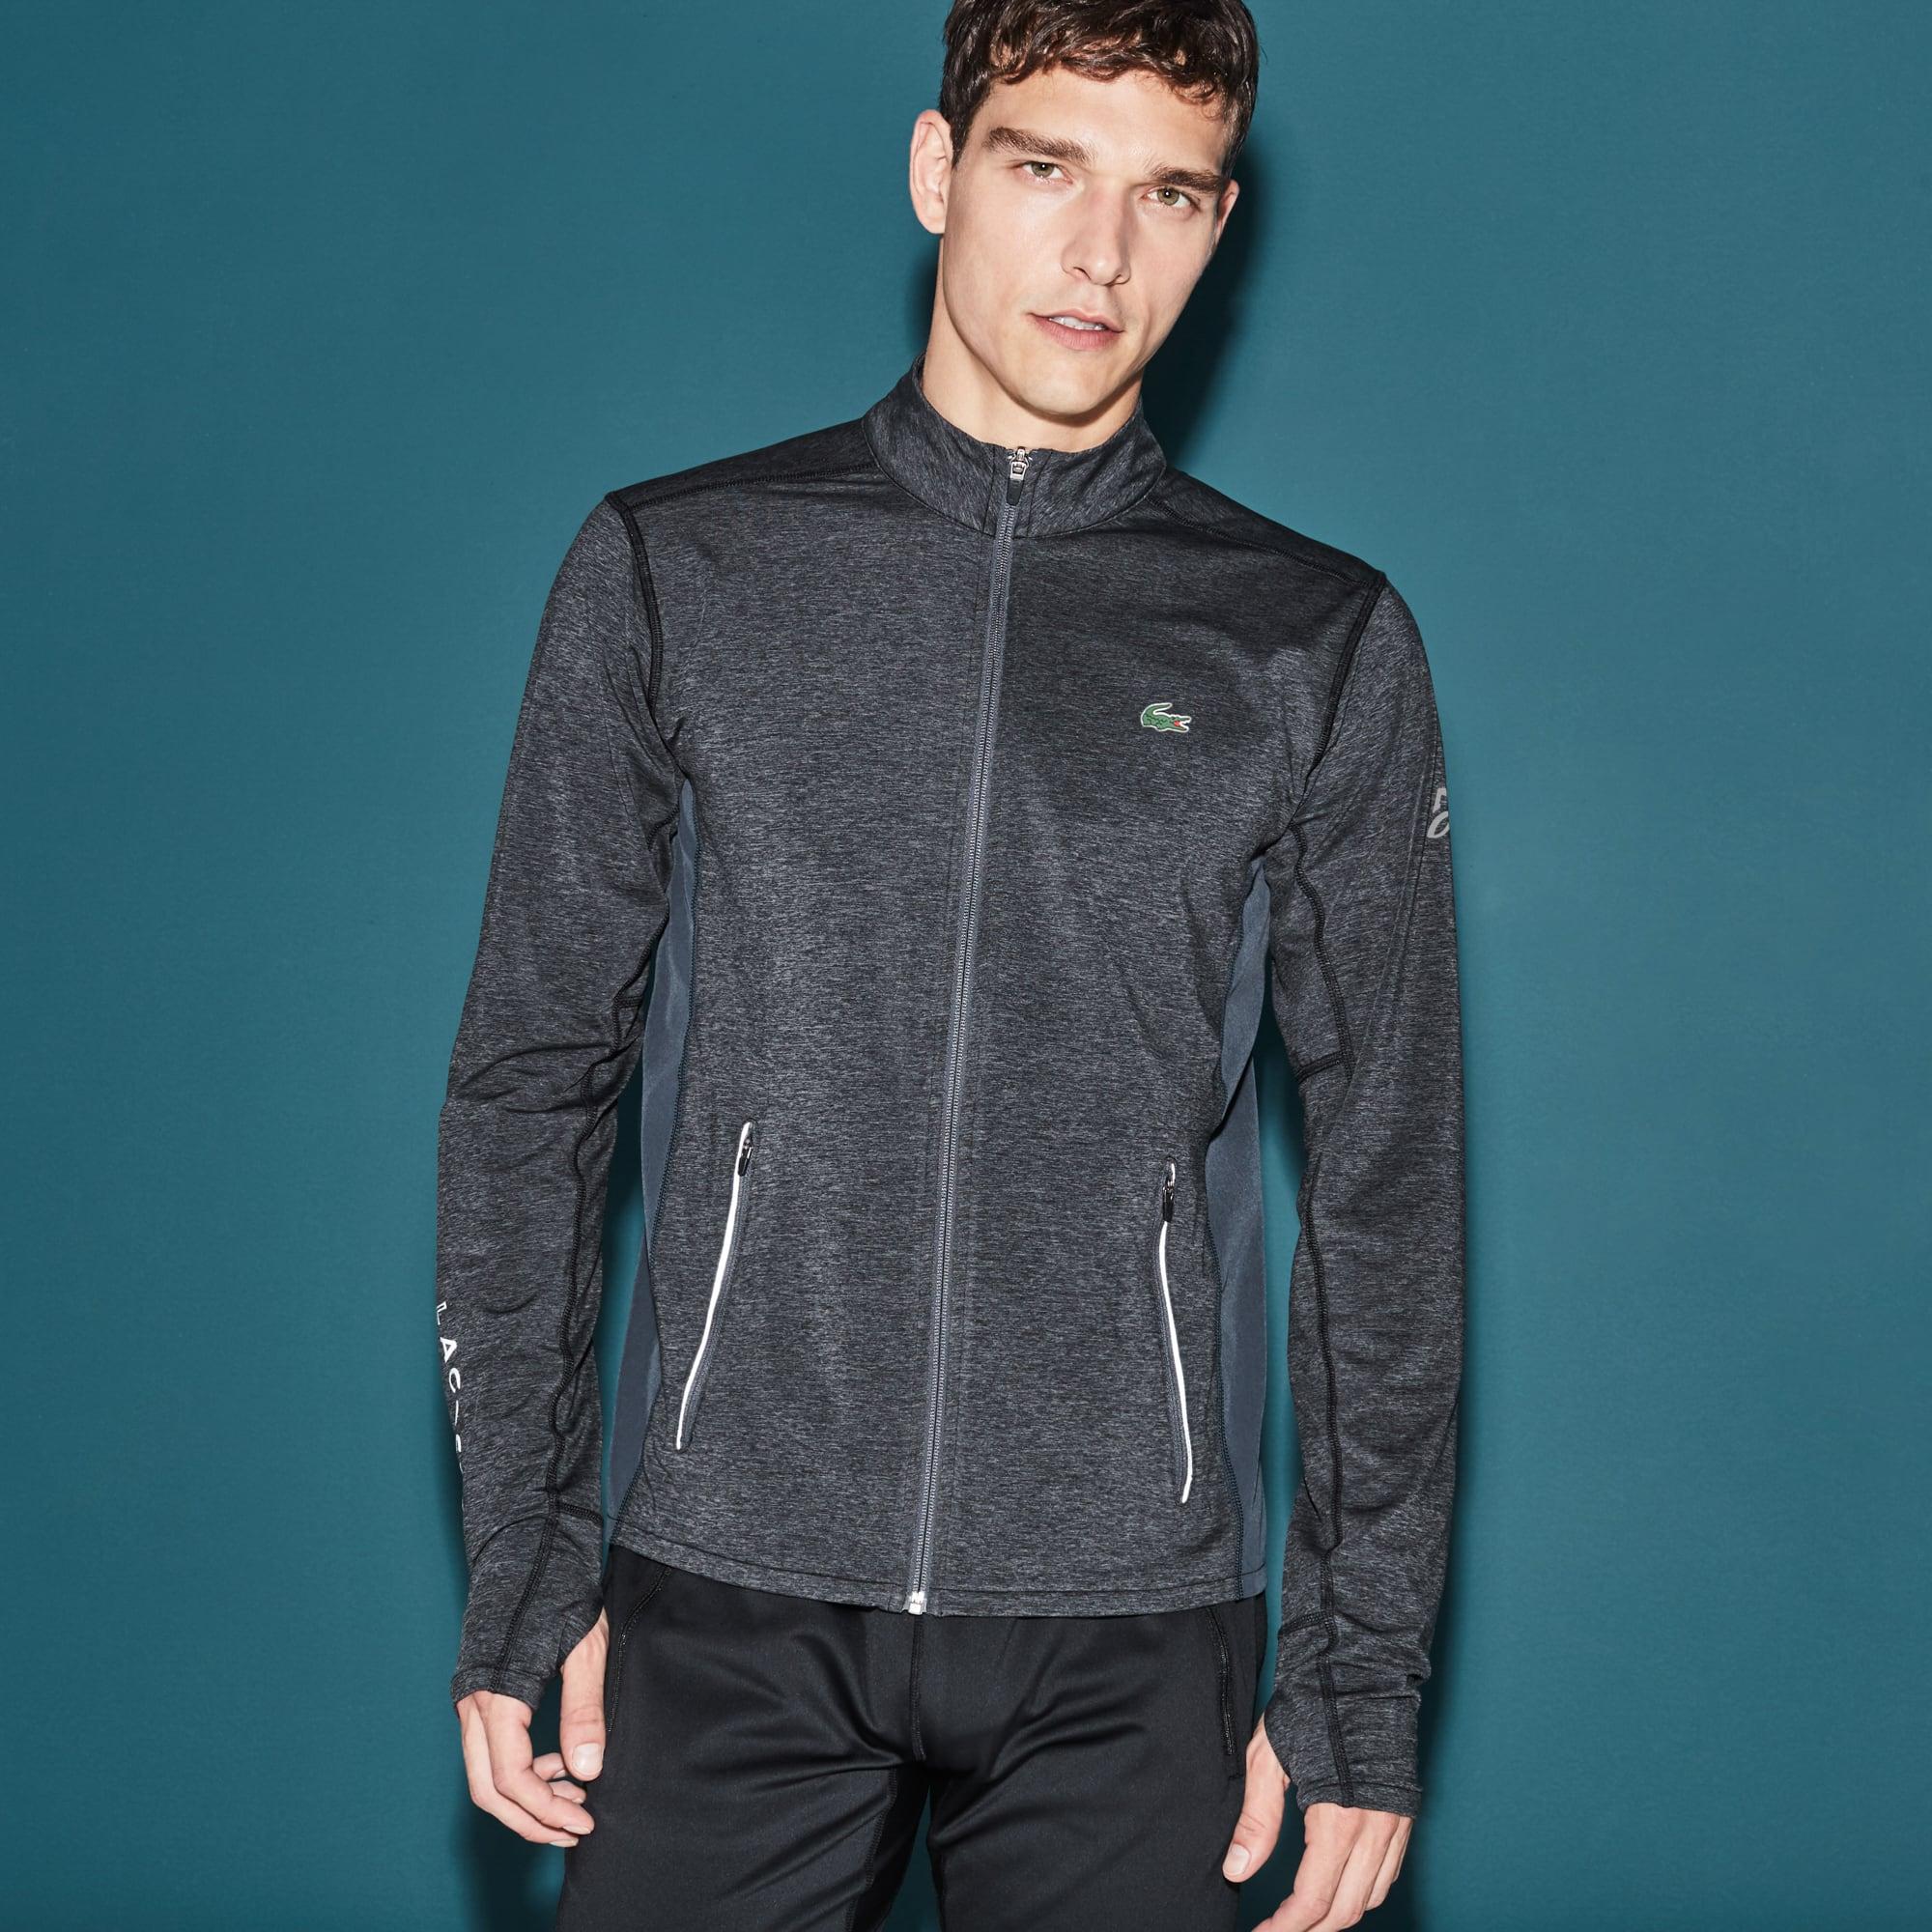 Men's Sweatshirt Lacoste Collection for Novak Djokovic - Exclusive Blue Edition